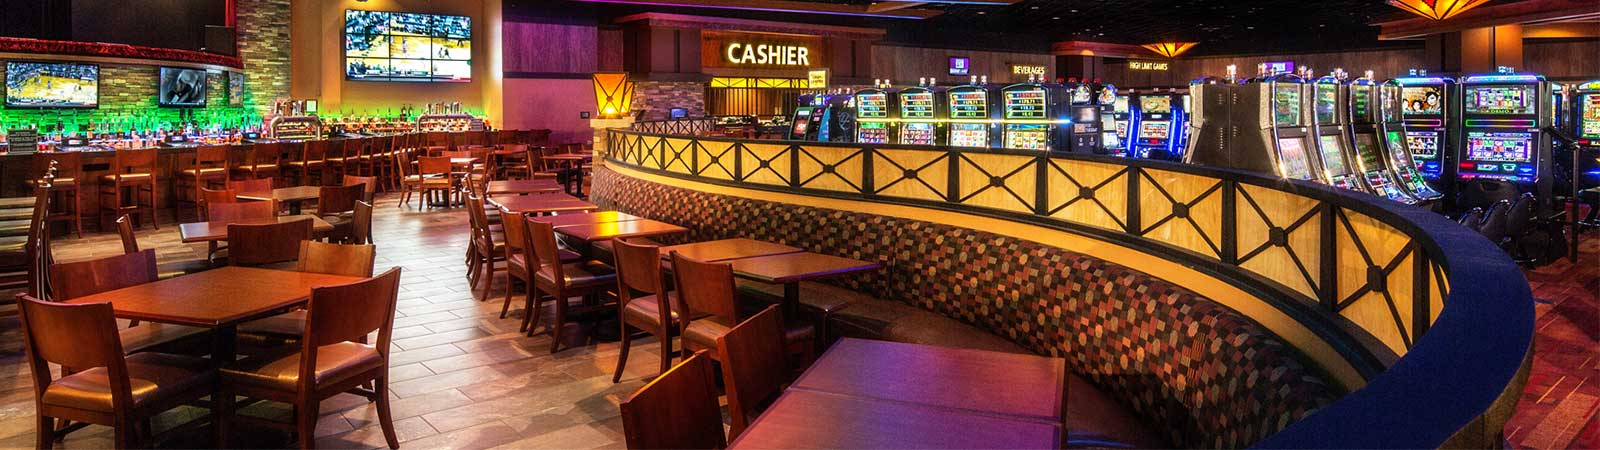 Casino partners indianapolis budapest casino poker